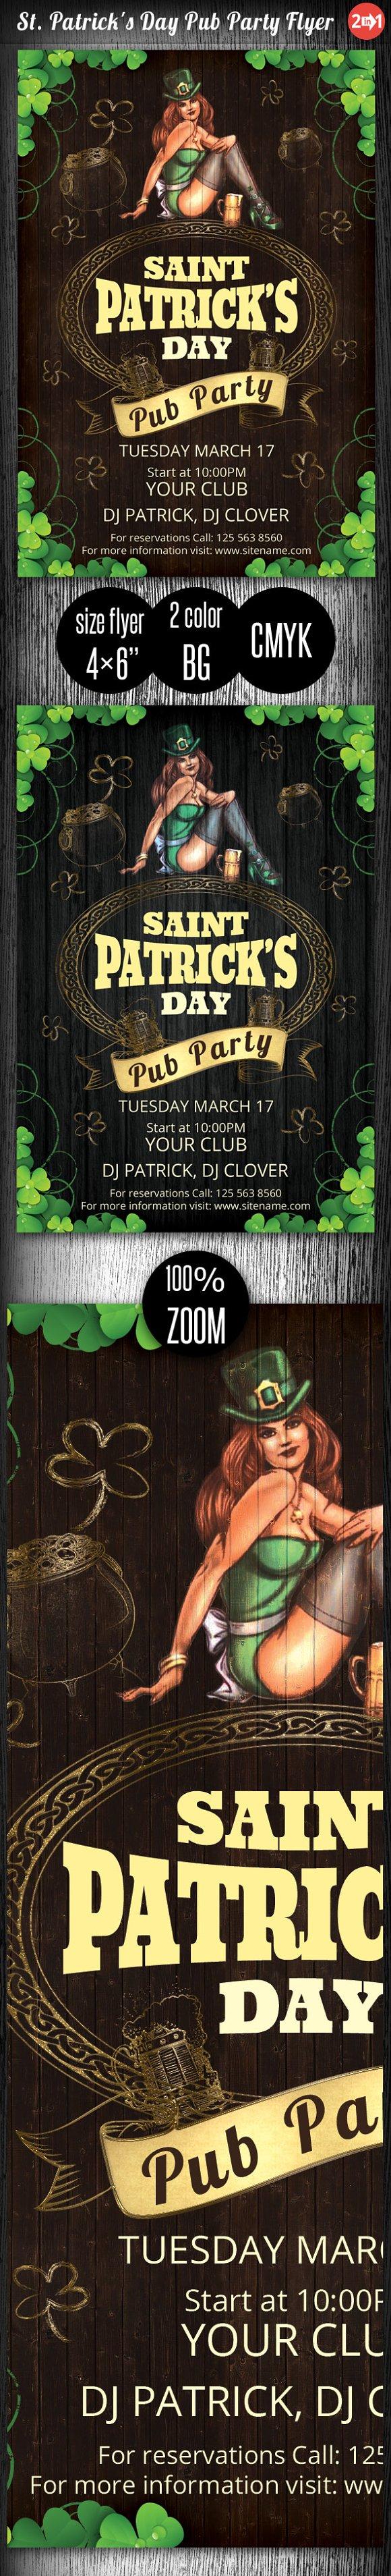 St. Patrick's Day Pub Party Flyer - Flyers